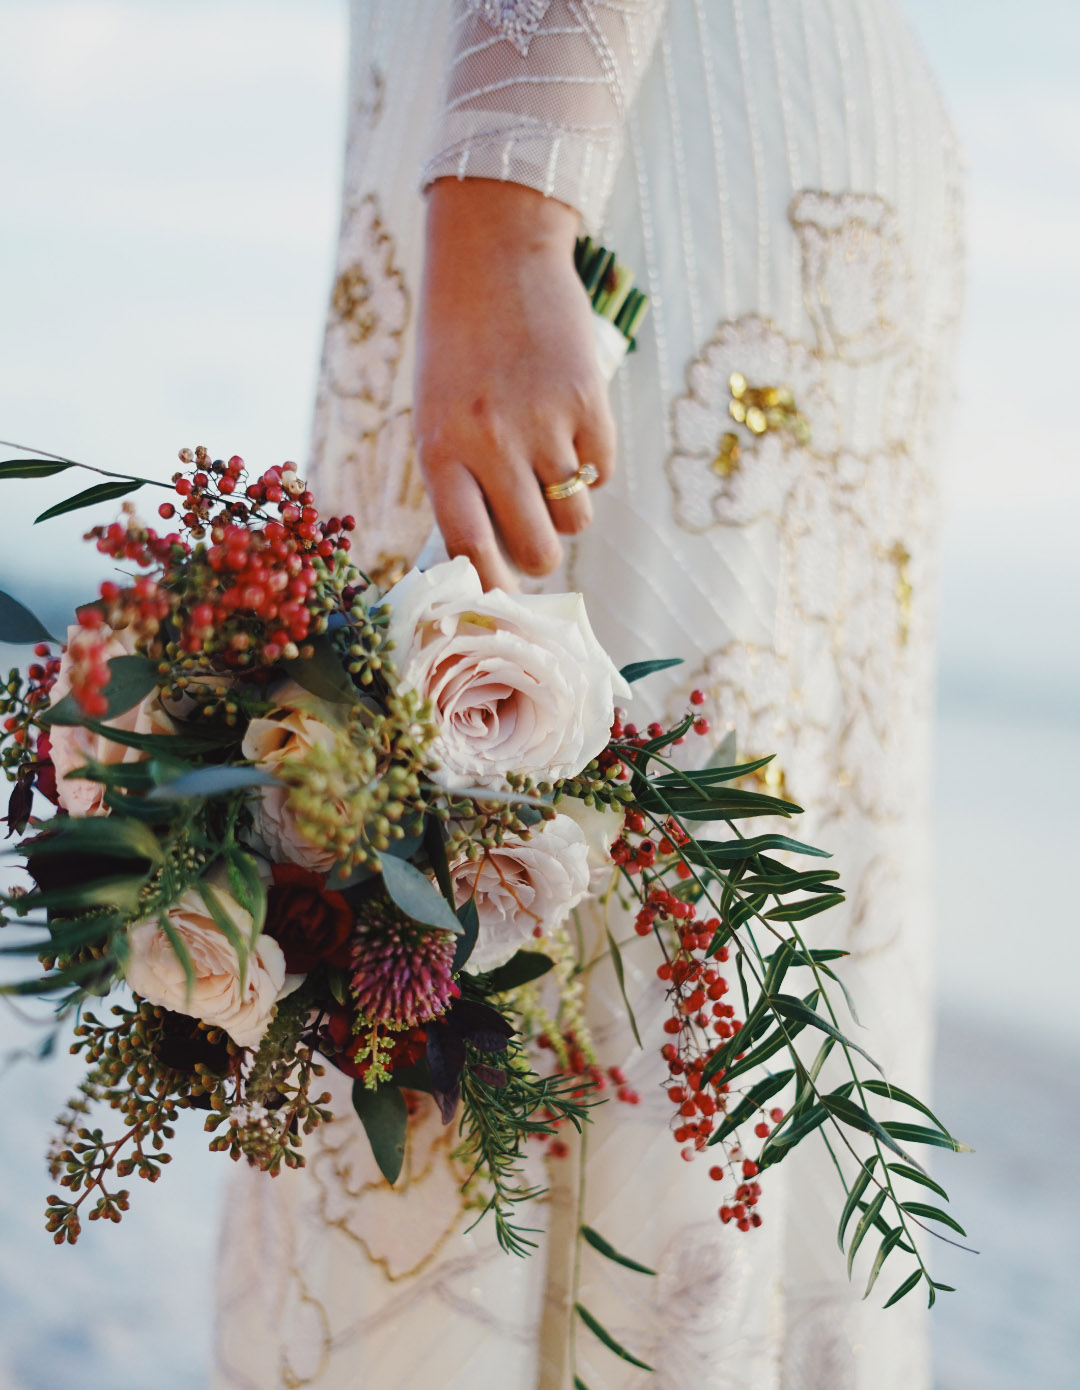 bouquet de mariee mariage boheme champetre retro Nice 06 paca